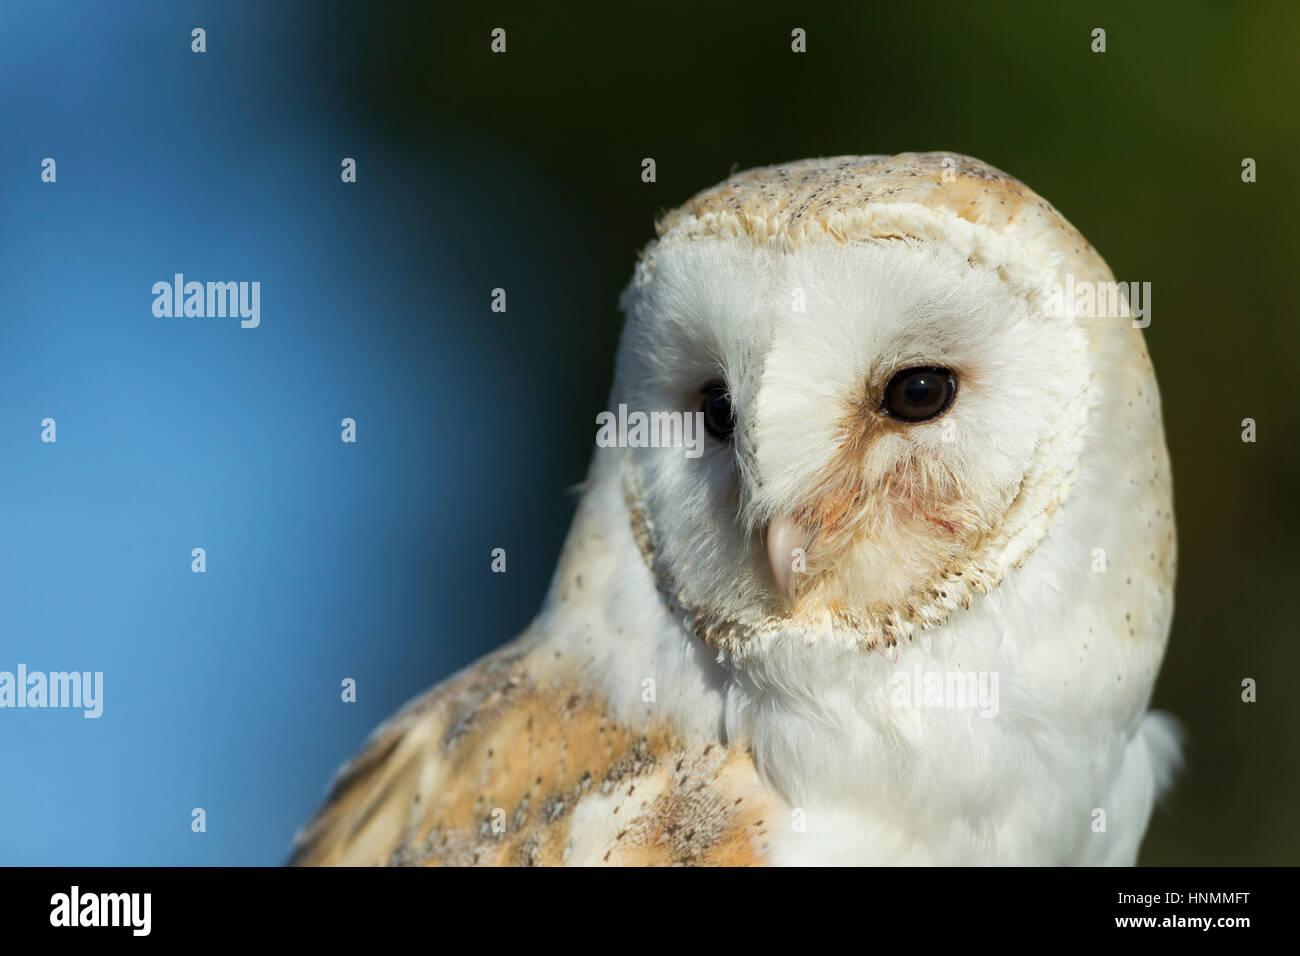 Barn owl Tyto alba (captive), adult female, profile, Hawk Conservancy Trust, Hampshire, UK in November. - Stock Image